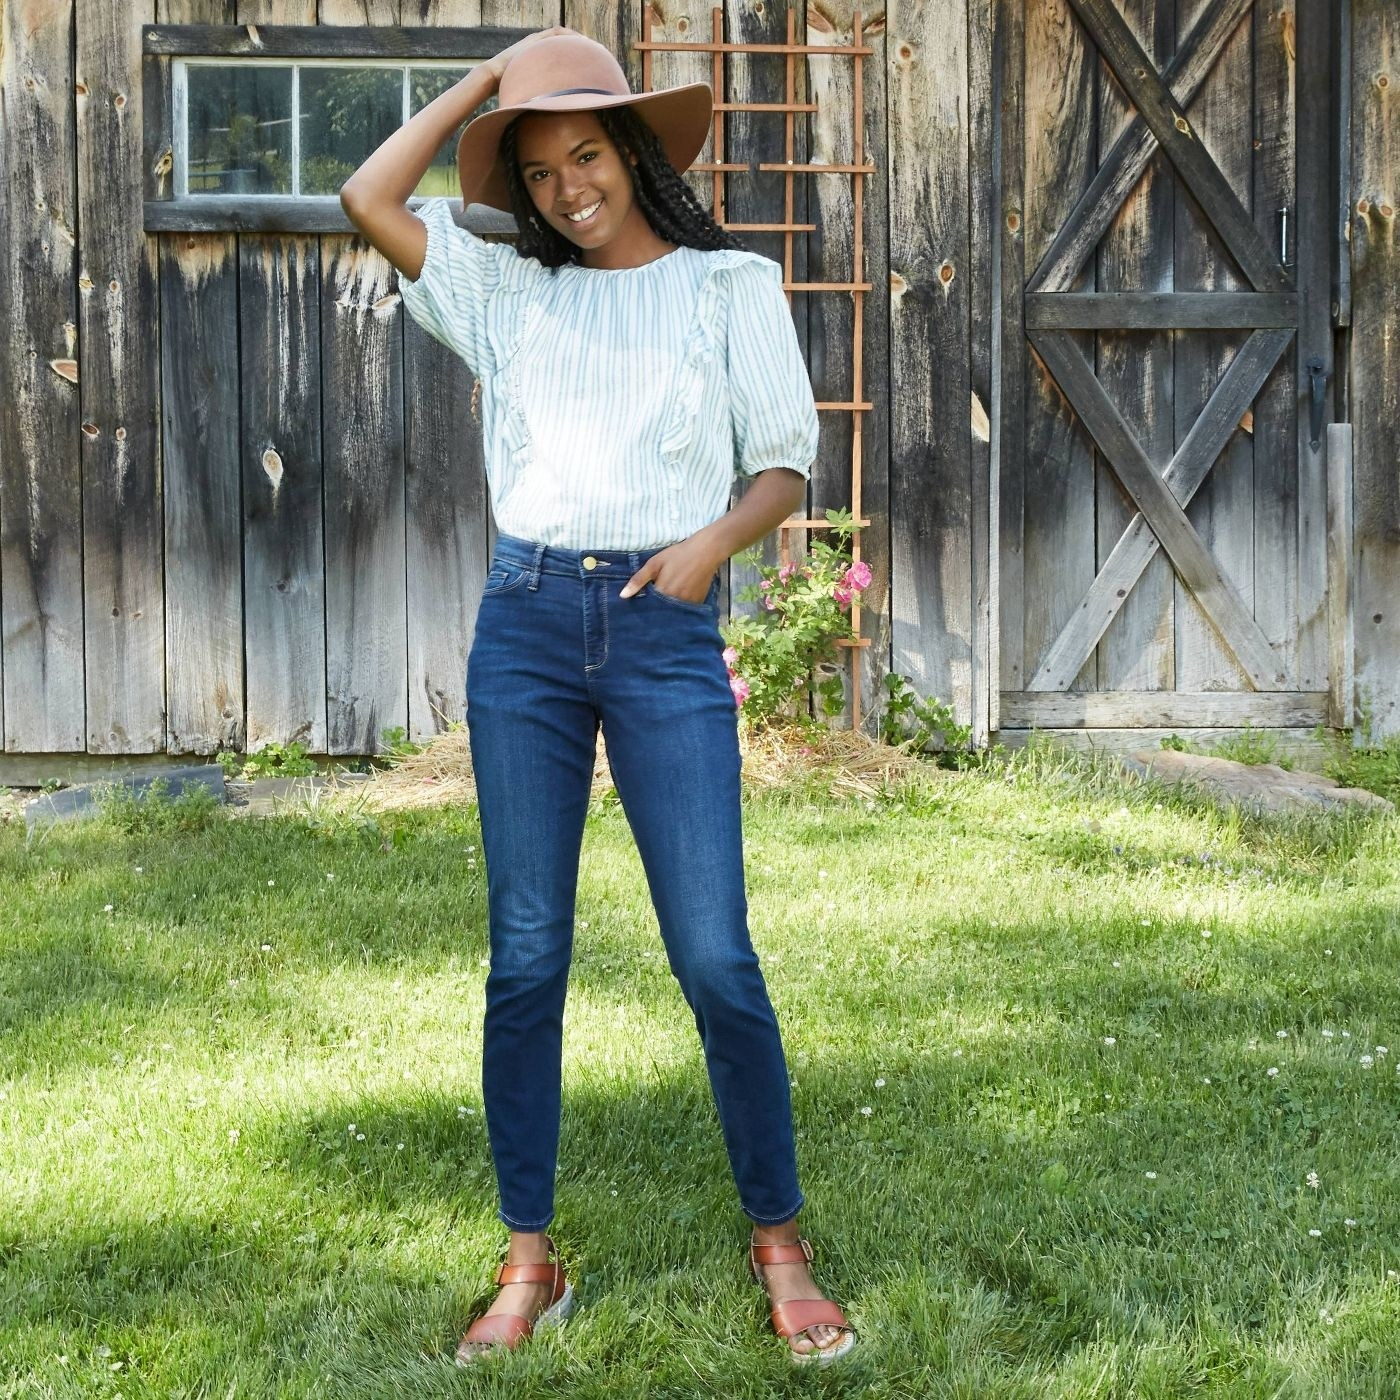 A model wearing mid wash blue skinny jeans